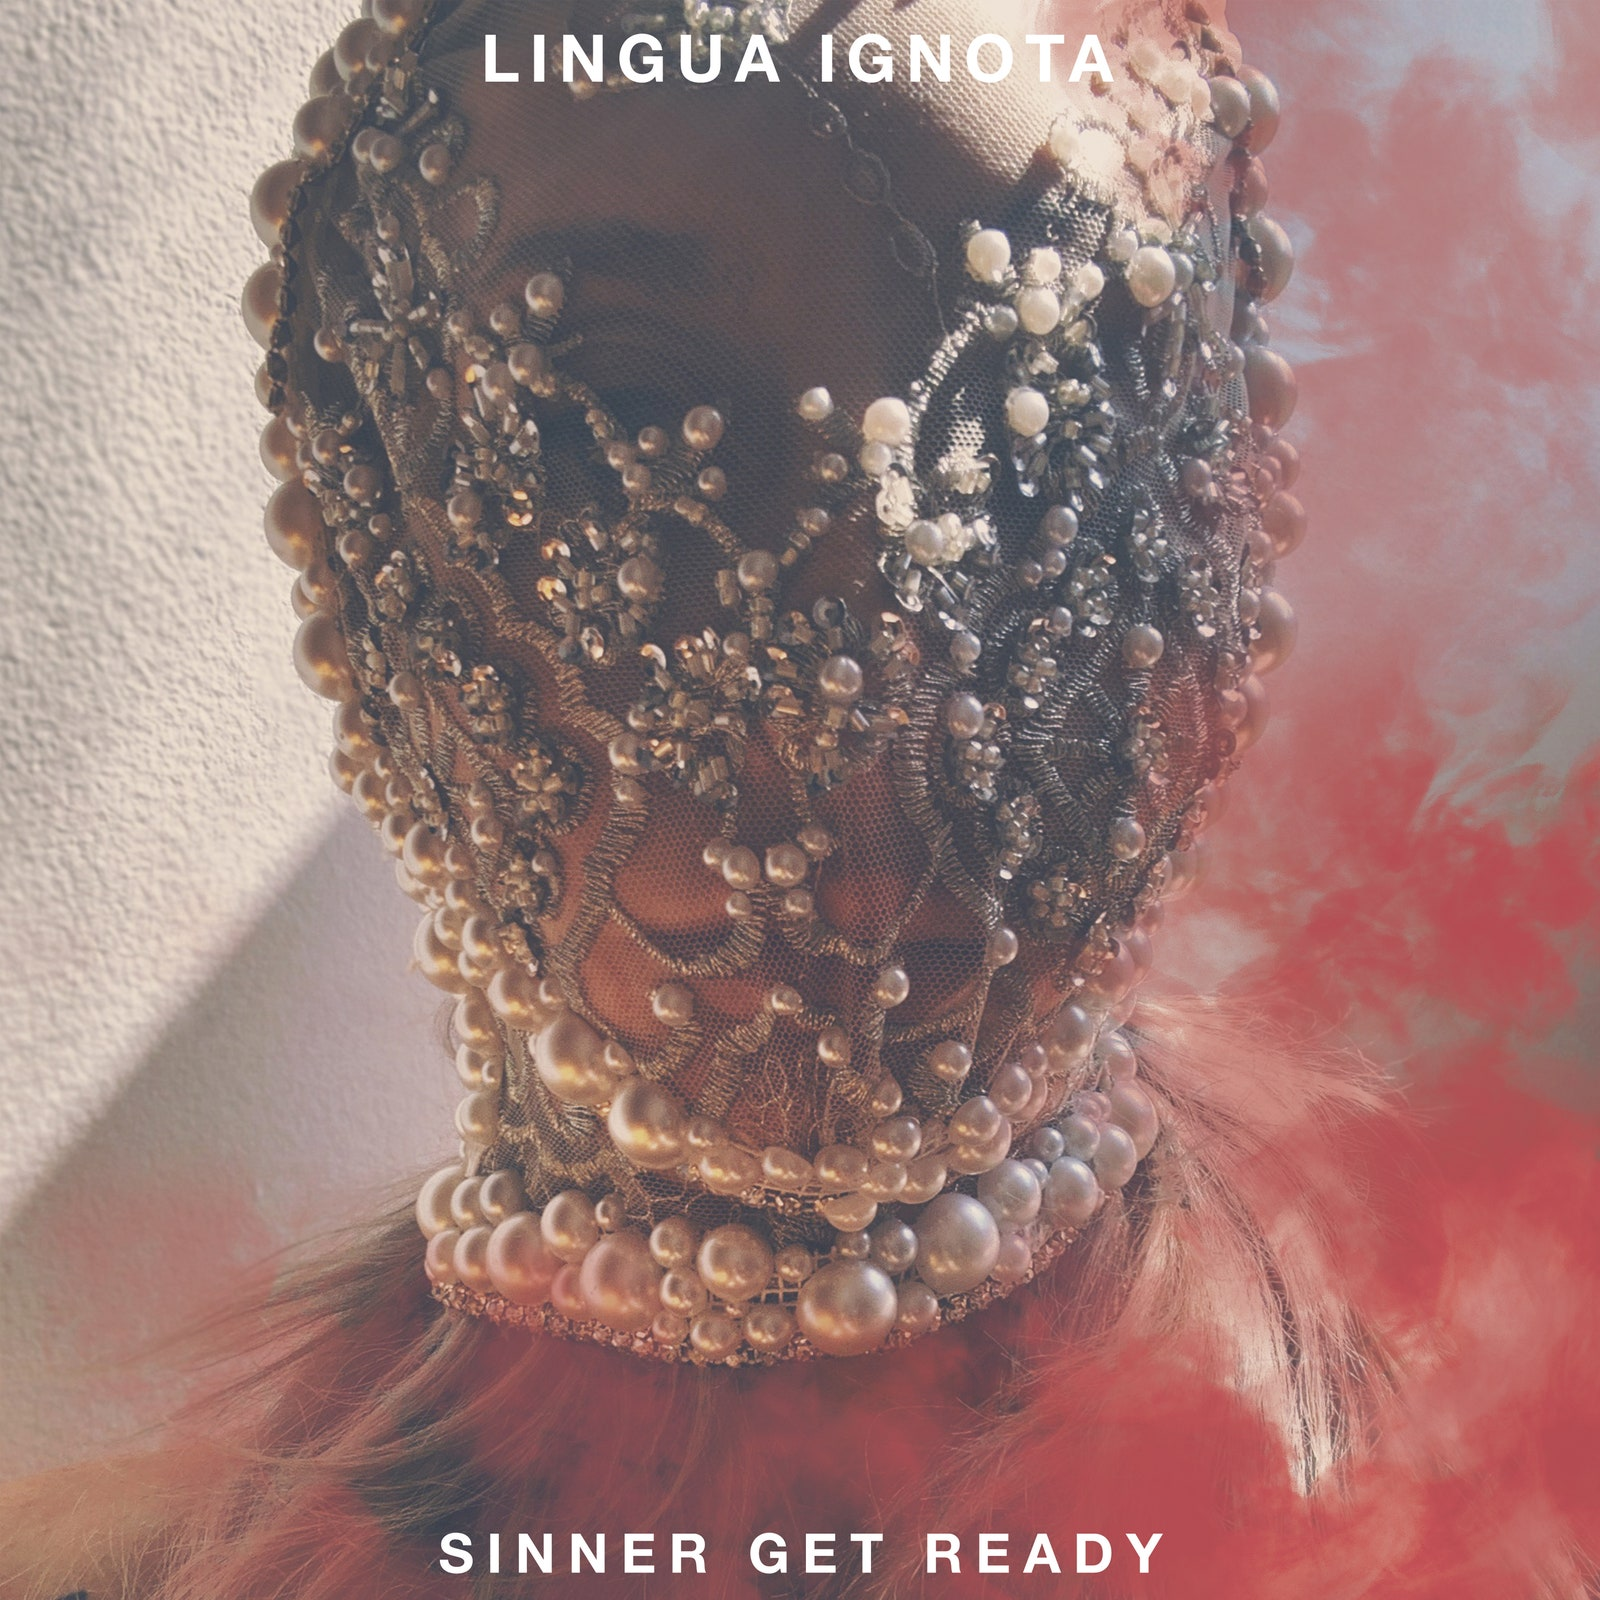 lingua ignota sinner get ready albumcover